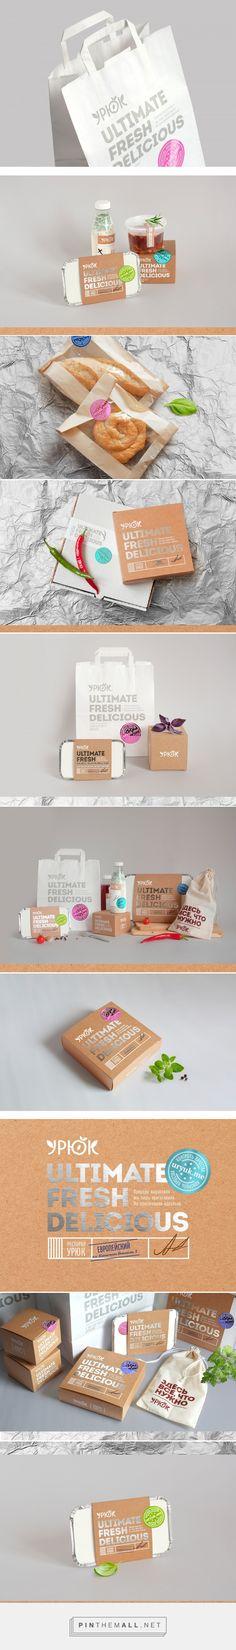 URYUK food delivery packaging design by Stas Neretin - http://www.packagingoftheworld.com/2017/04/uryuk.html